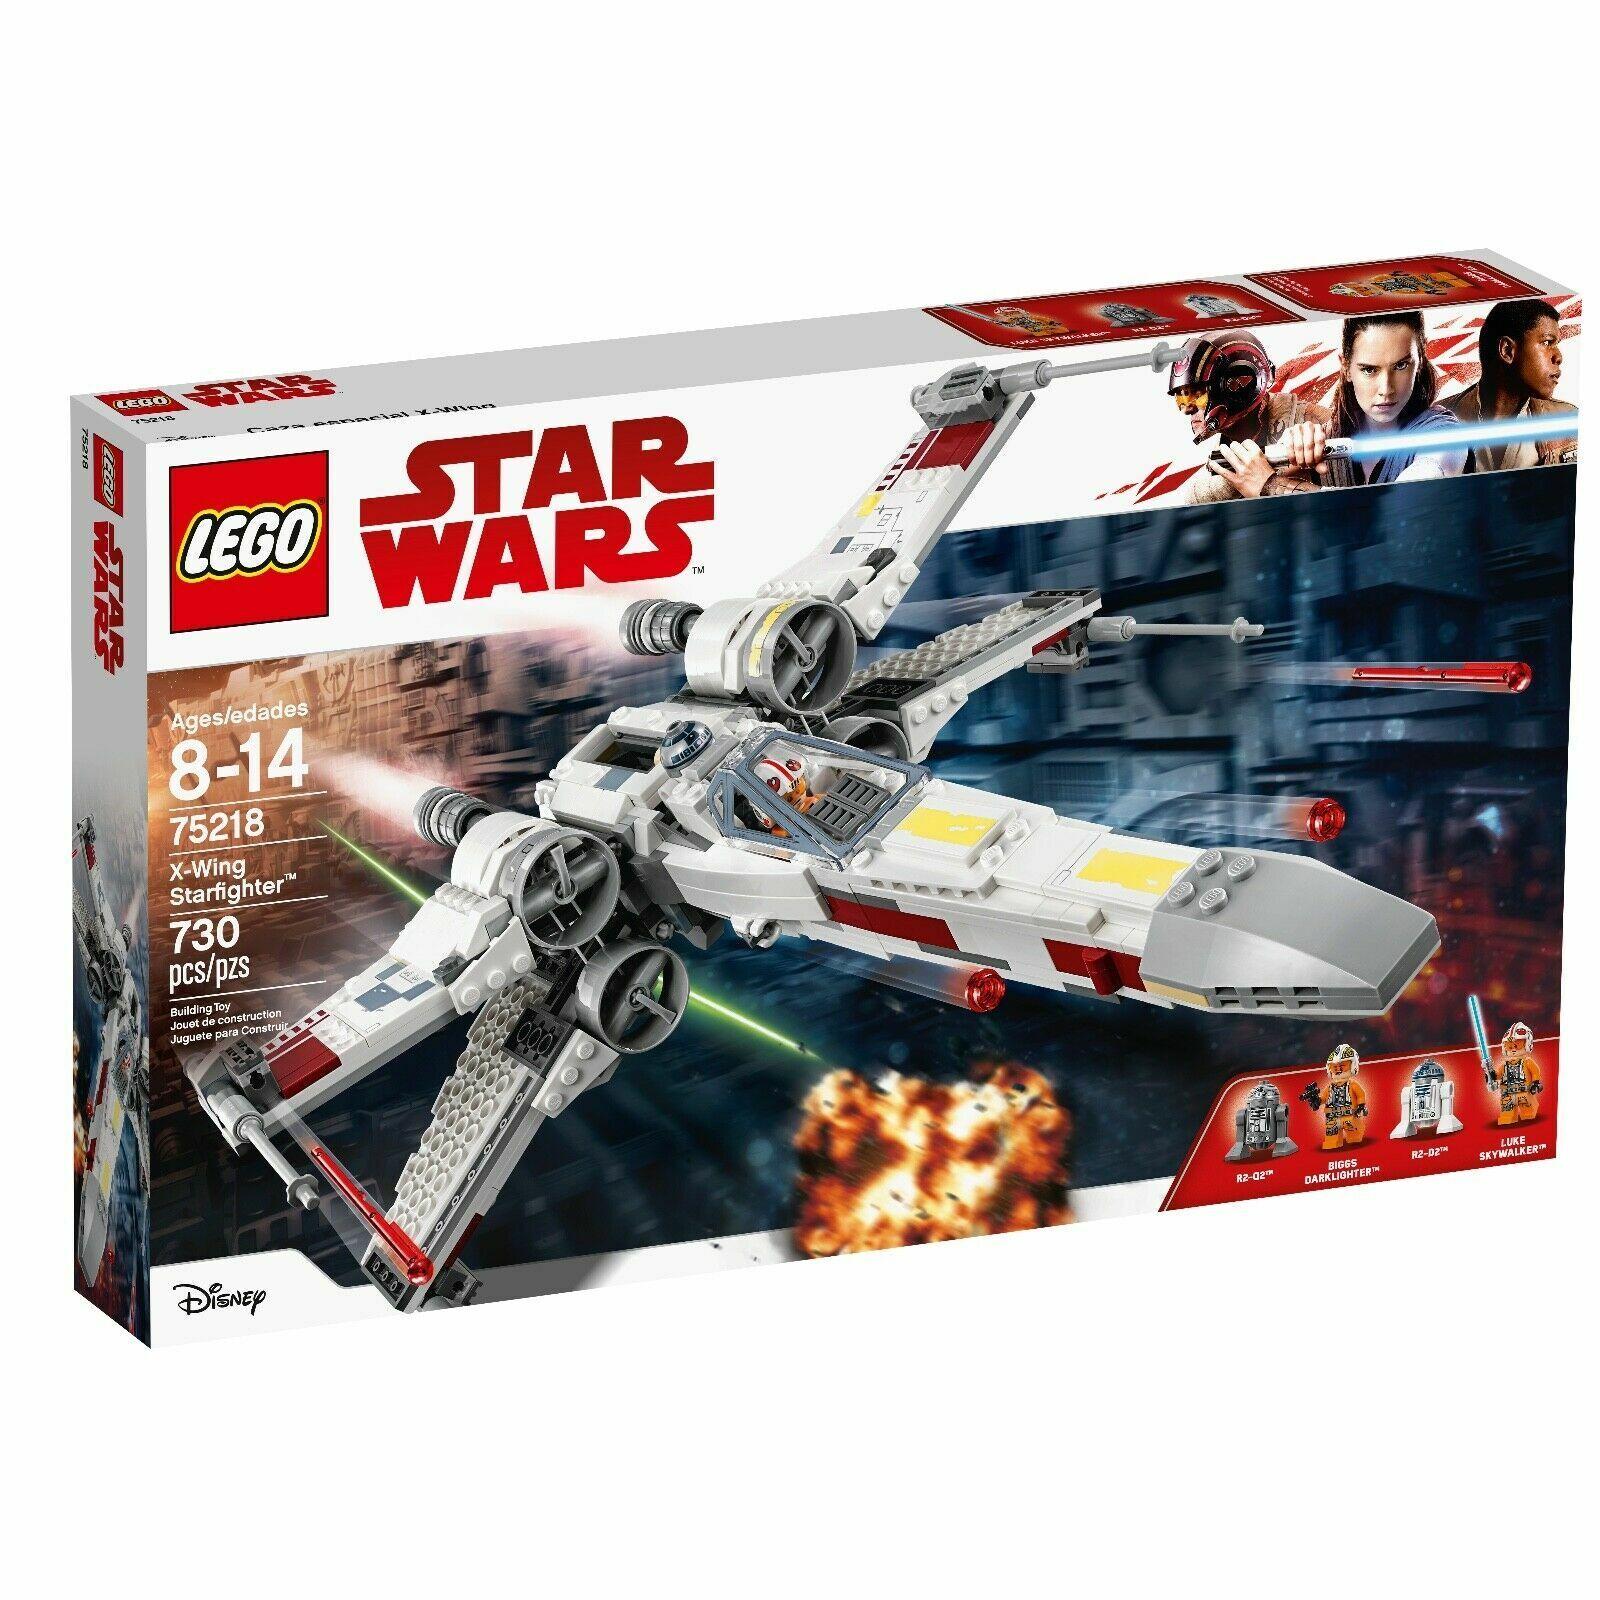 nuovo LEGO  estrella guerras X-Wing estrellacombatiente 75218 730 Pieces  centro commerciale di moda